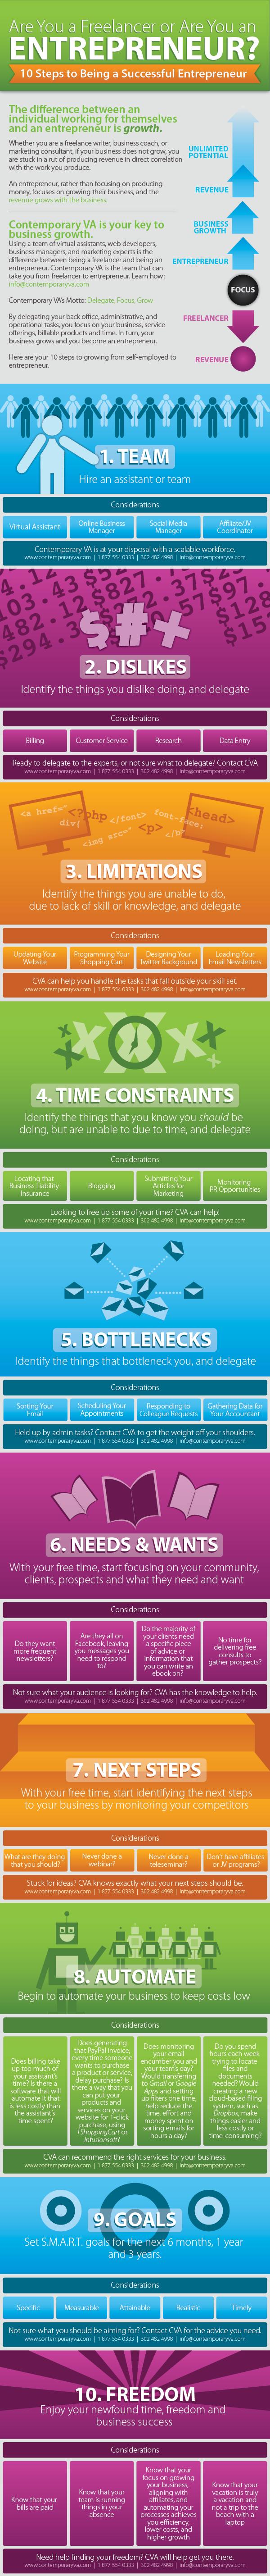 Entrepreneurial-Qualities